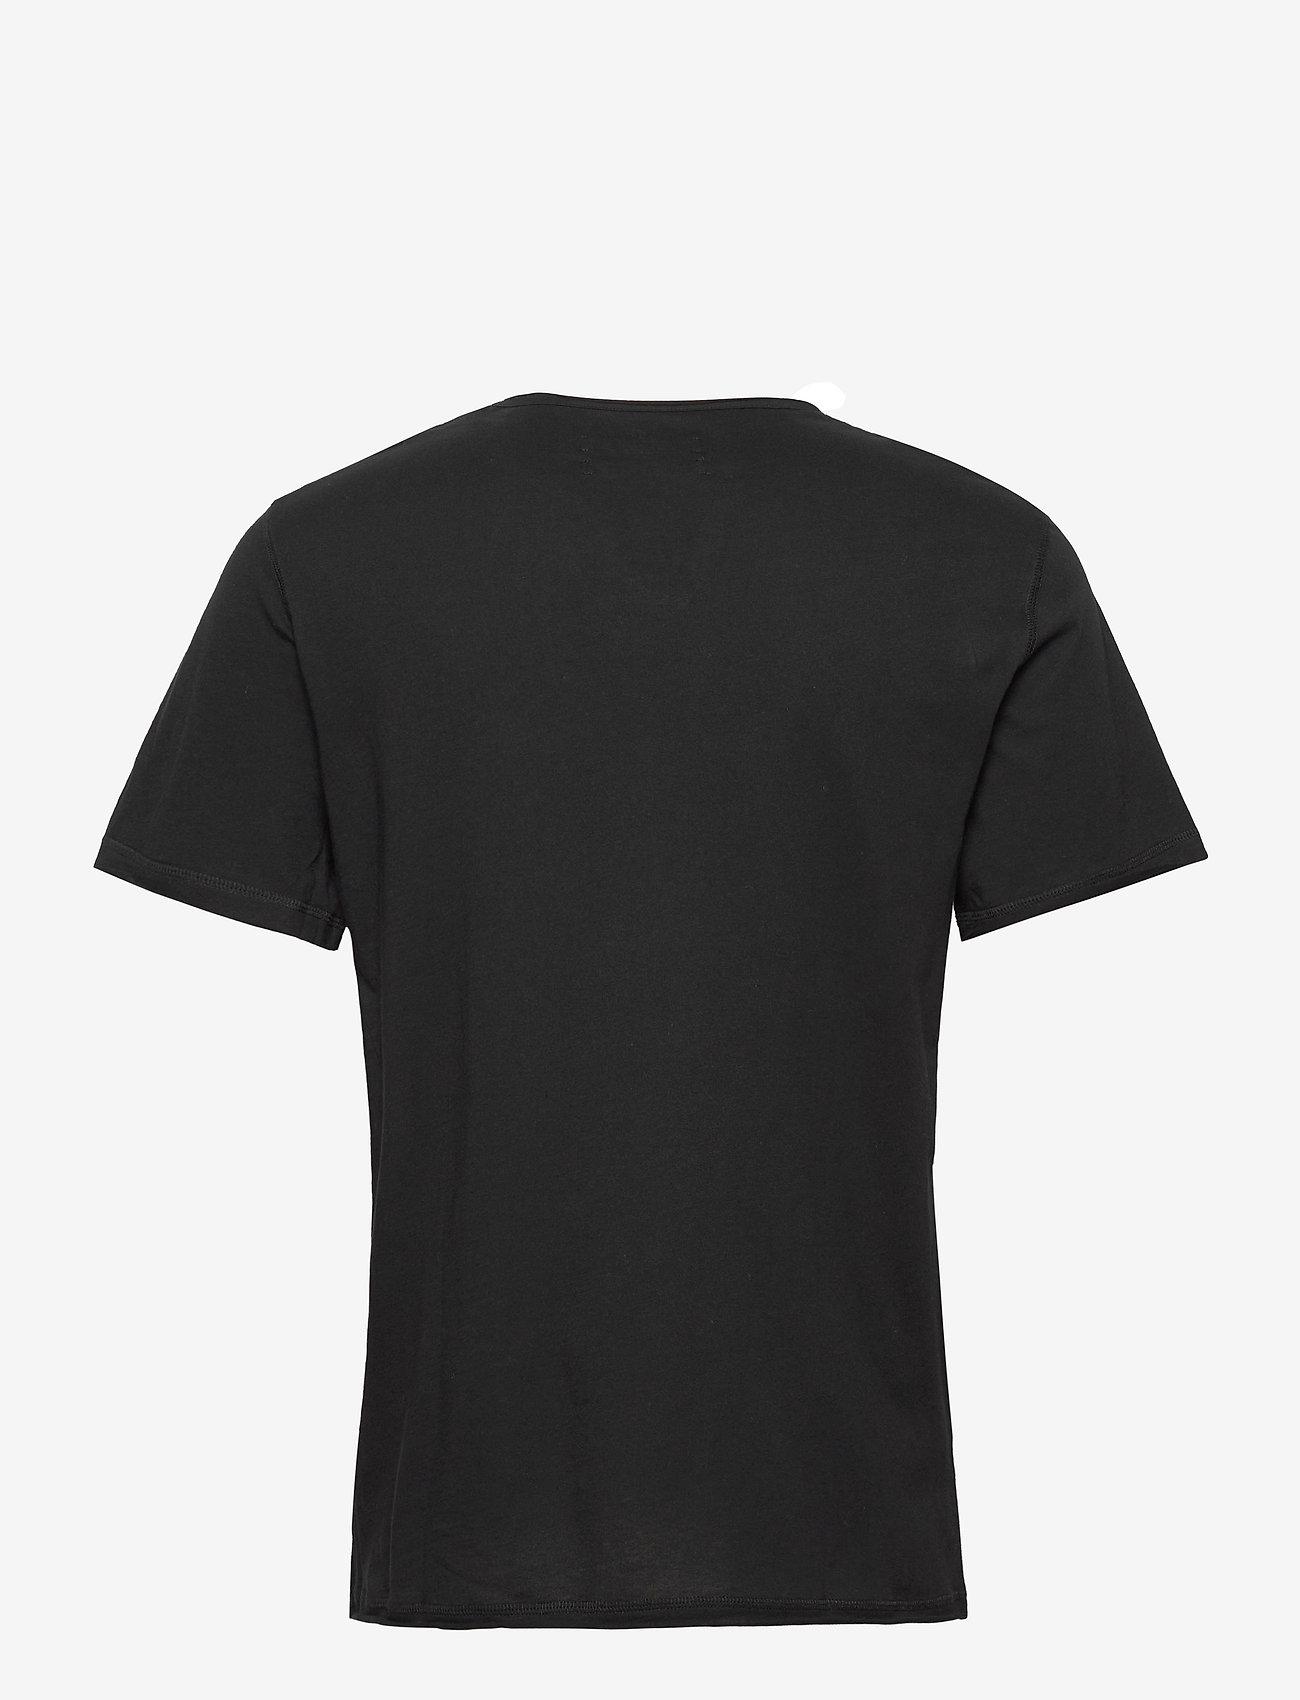 Zadig & Voltaire - MONASTIR MC ECO TUNISIEN MC ECOFRIENDLY - basic t-shirts - black - 1